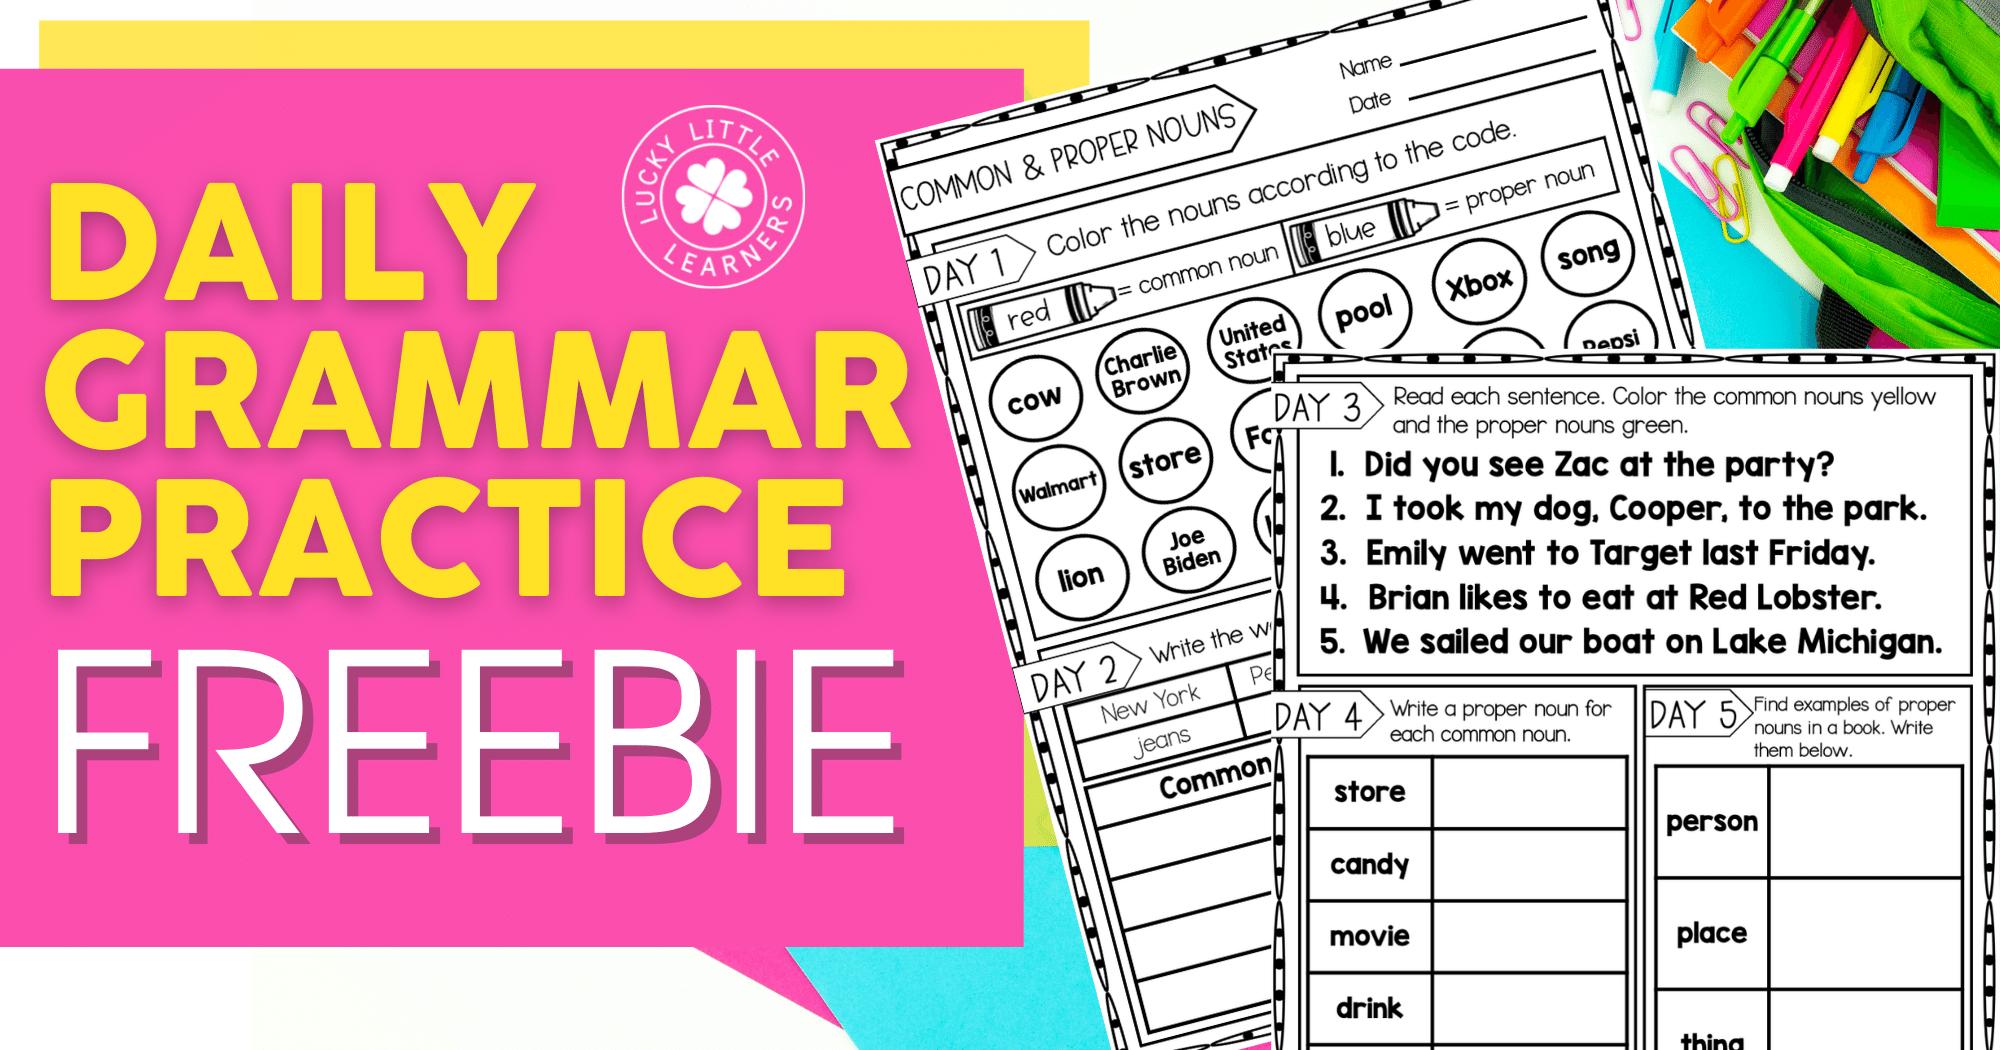 Daily Grammar Practice Freebie